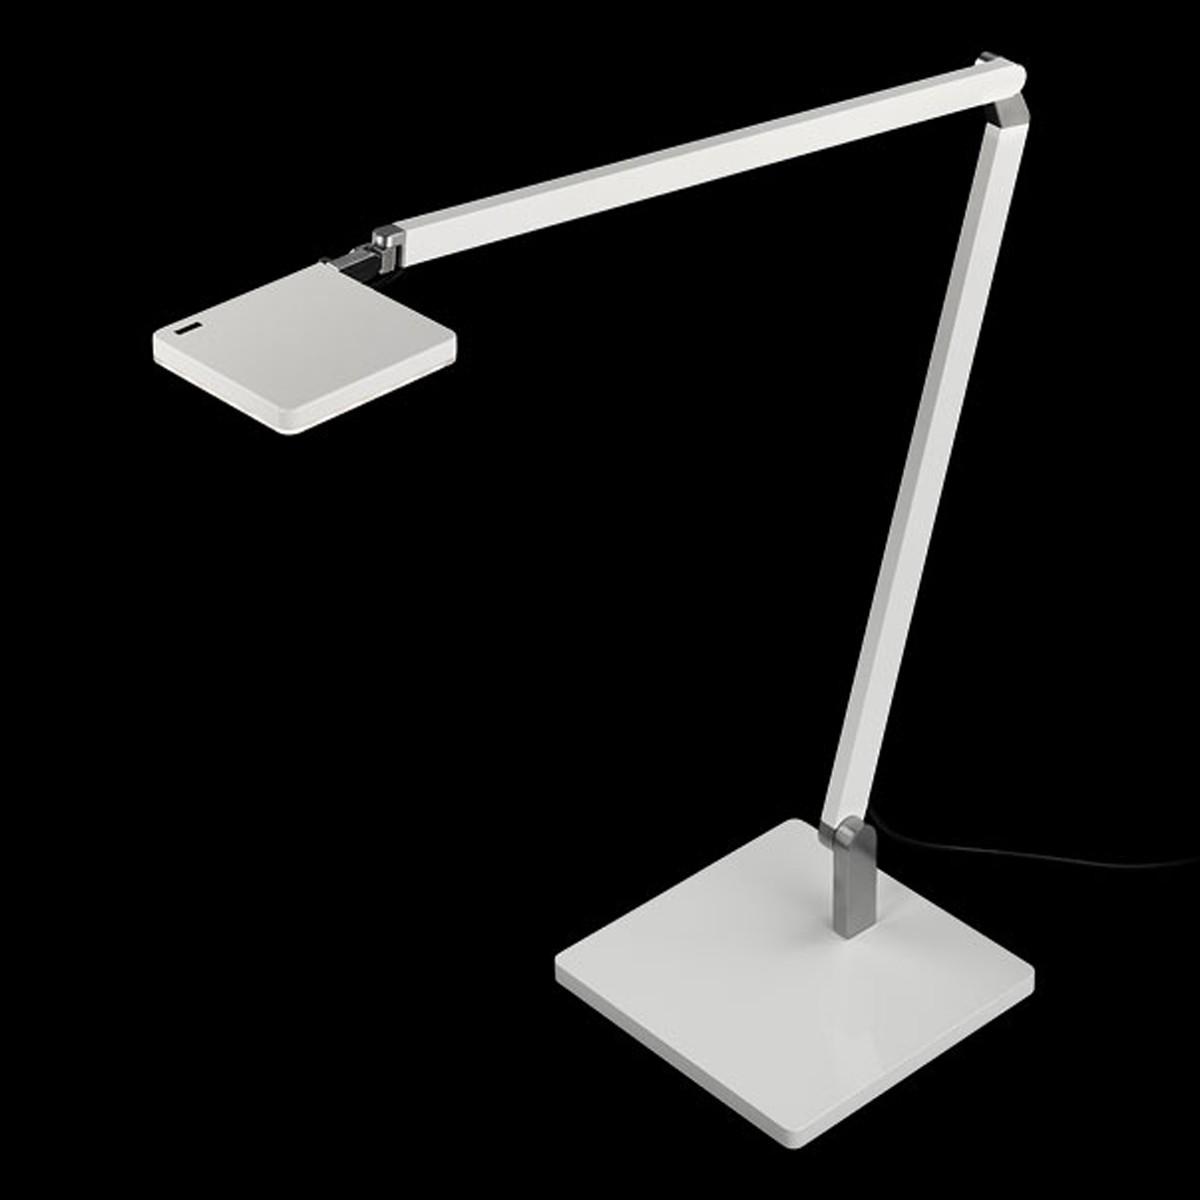 Nimbus Roxxane Home LED Tischleuchte, 2700 K, weiß